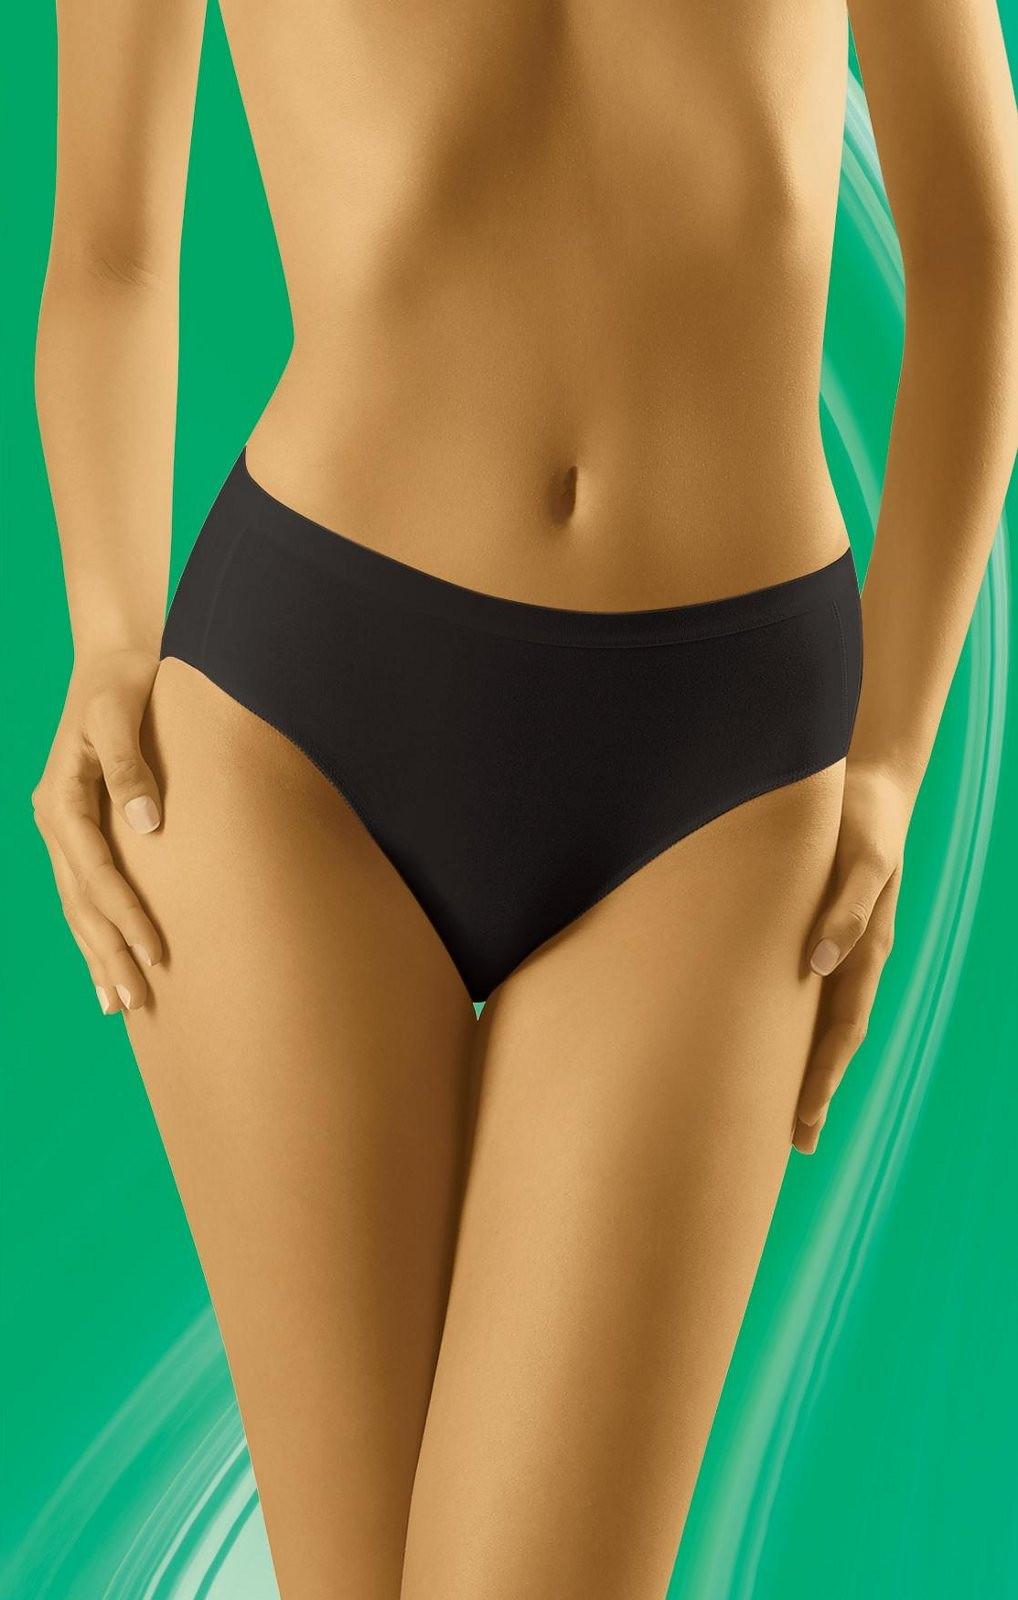 Kalhotky Wolbar Tahoo Comforta Barva: béžová, Velikost: XL